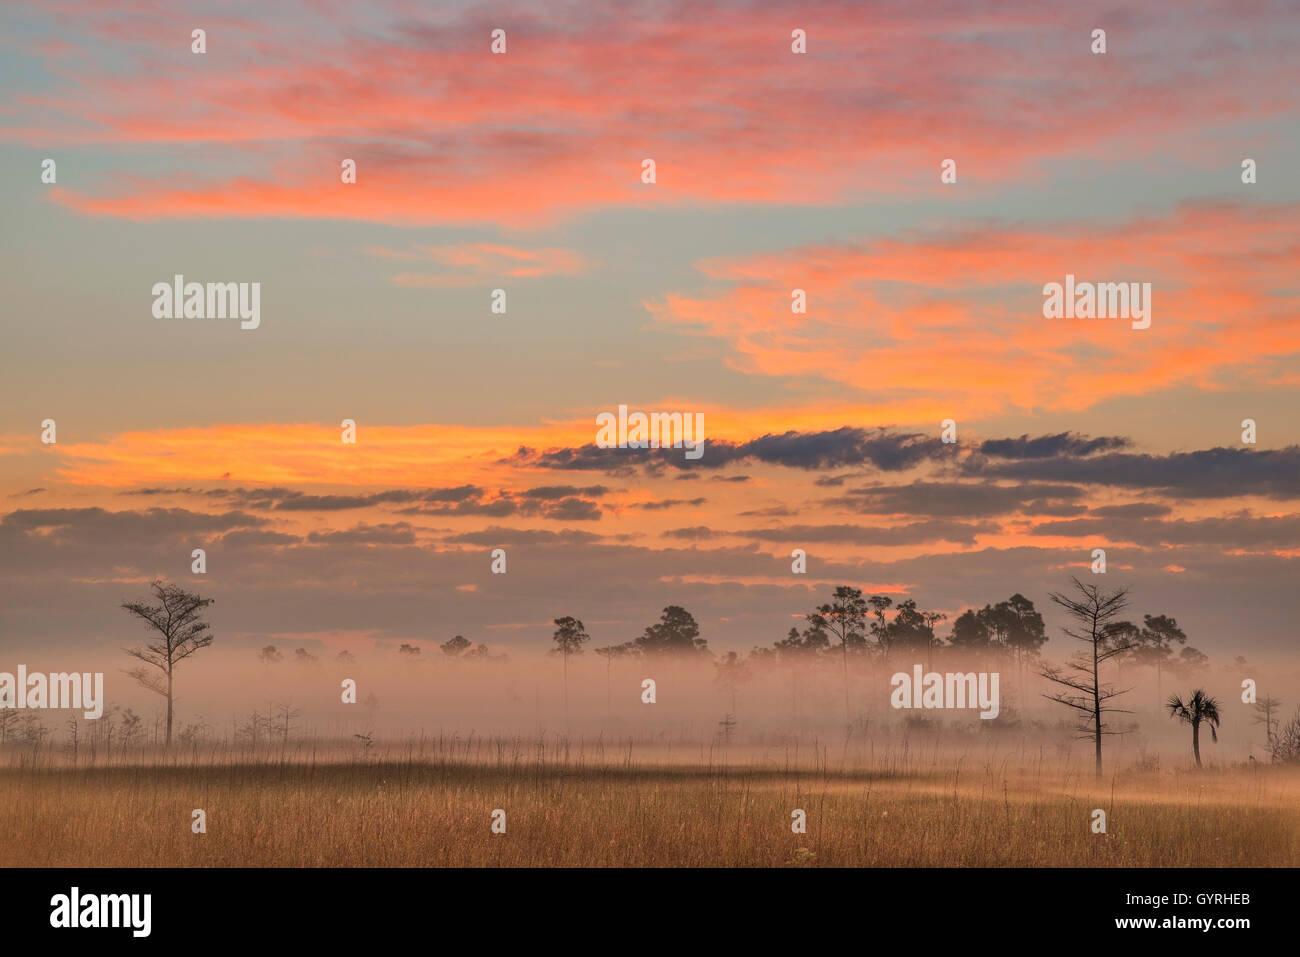 Sunrise, Sawgrass Prairie and Slash Pine Trees (Pinus elliottii), Everglades National Park, Florida USA - Stock Image